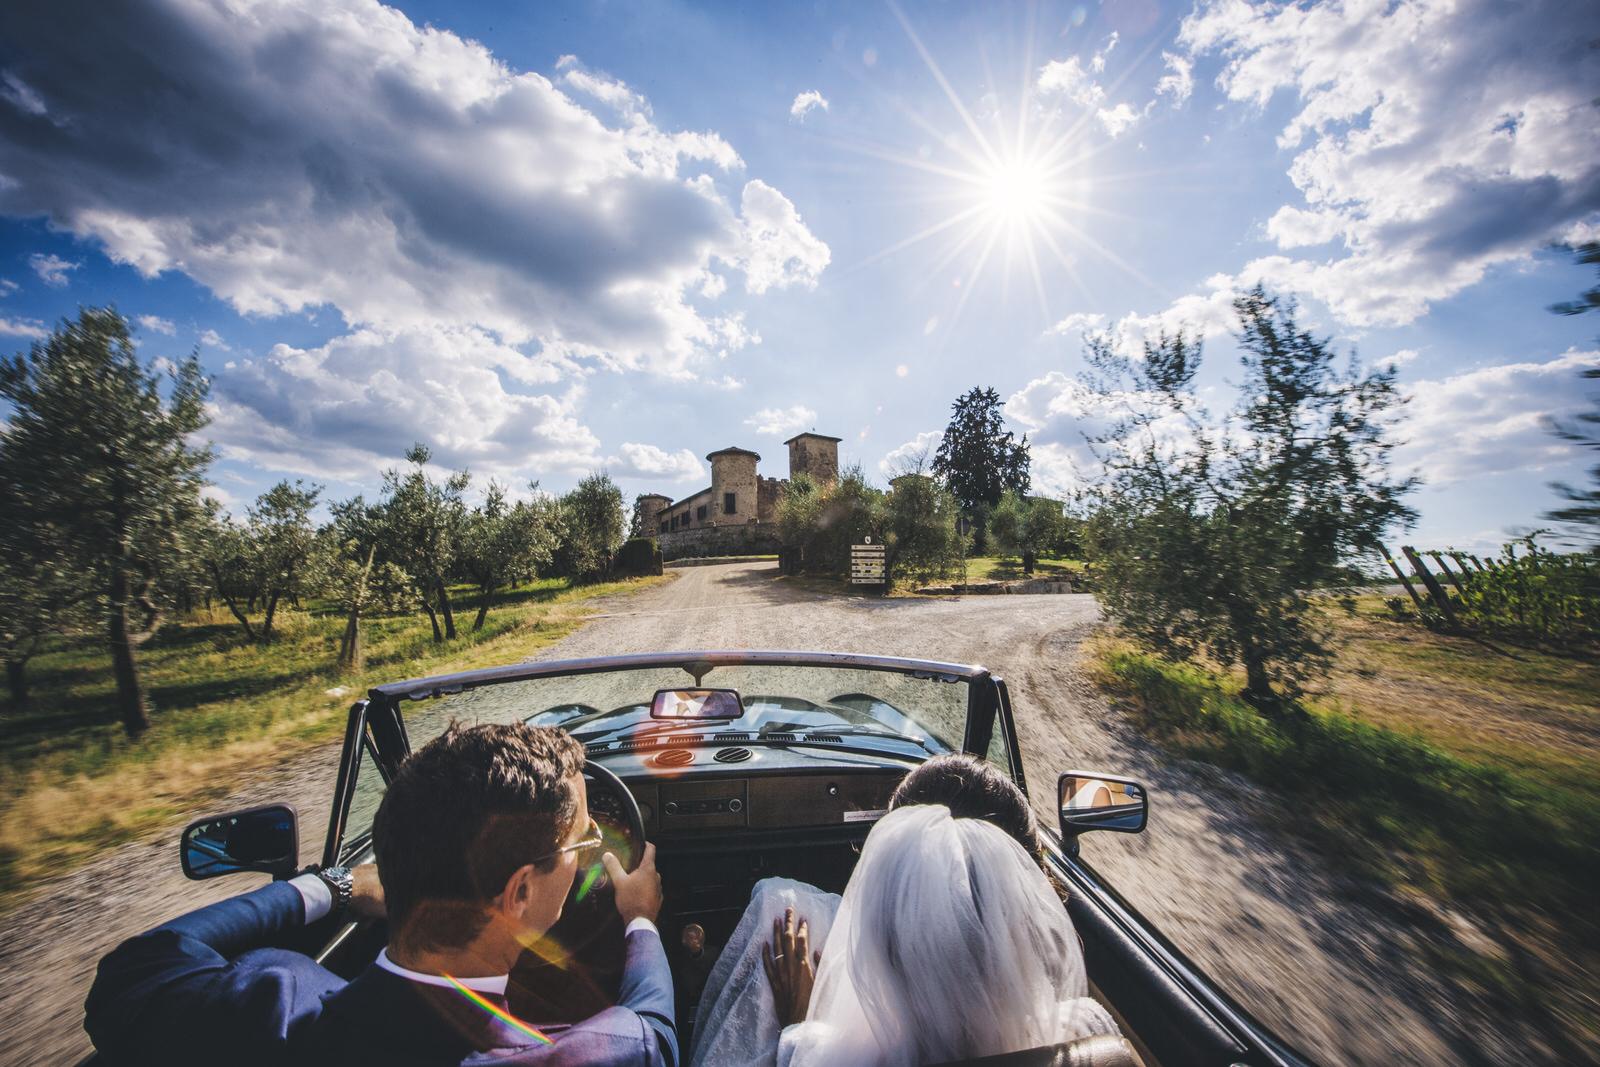 wedding photographer in italy-venice-tuscany-florence-amalfi coast-como lake-villa del balbianello-siena-amalfi-ravello-belmond-villa cimbrone22